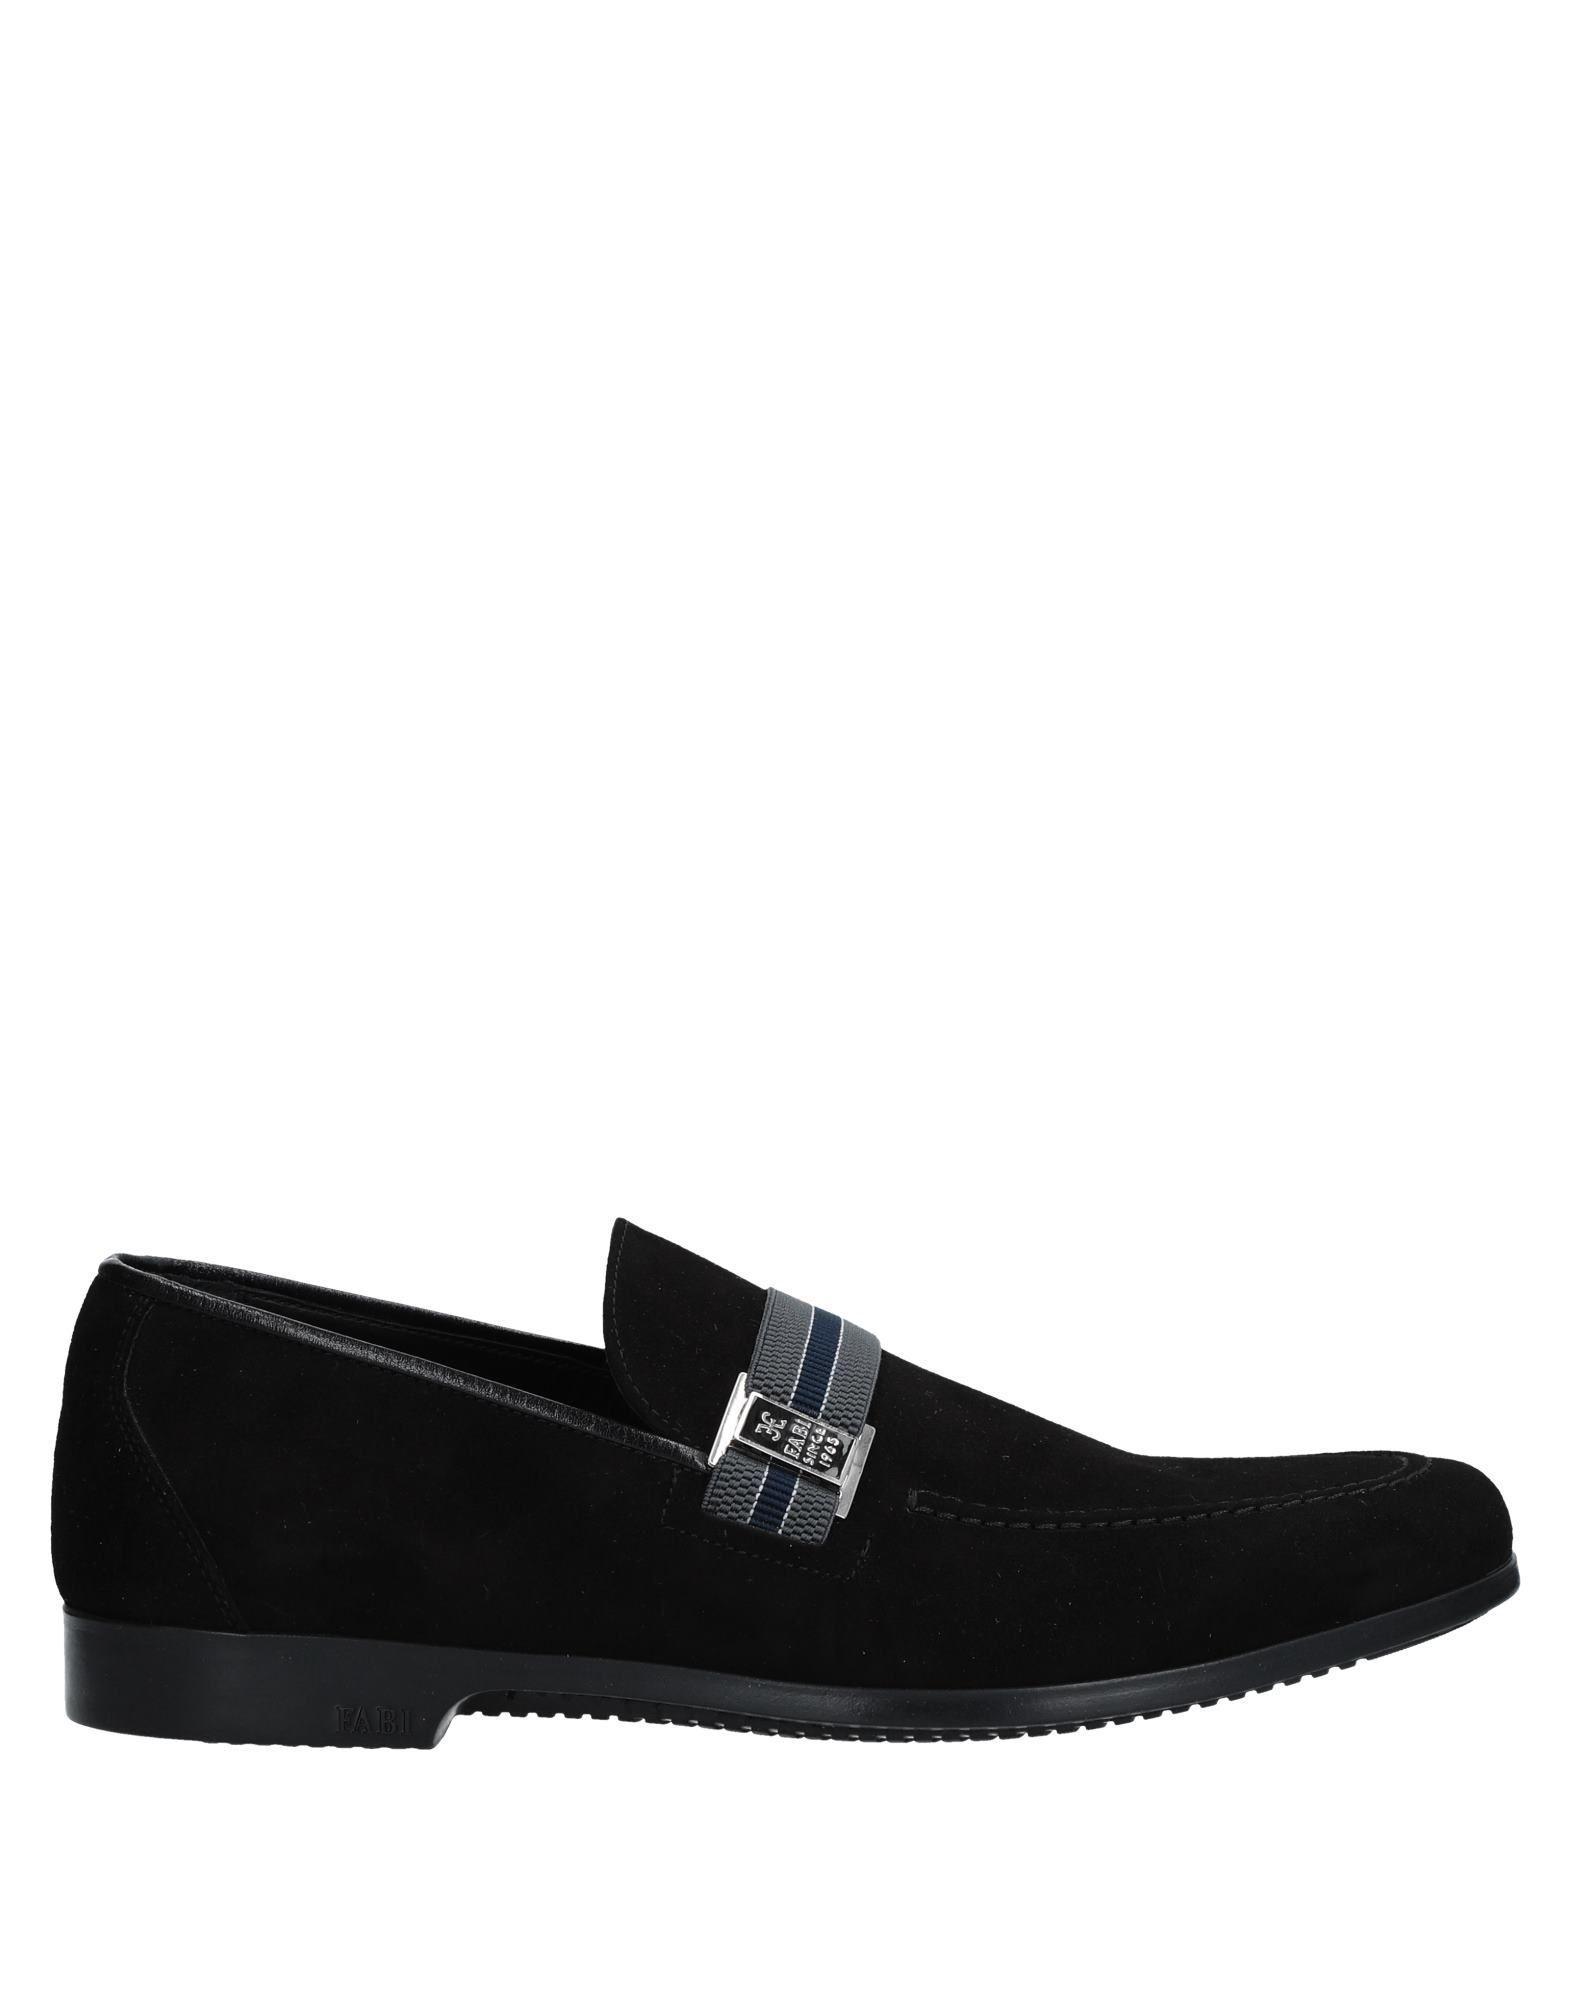 Fabi Mokassins Herren  11543422MK Gute Qualität beliebte Schuhe